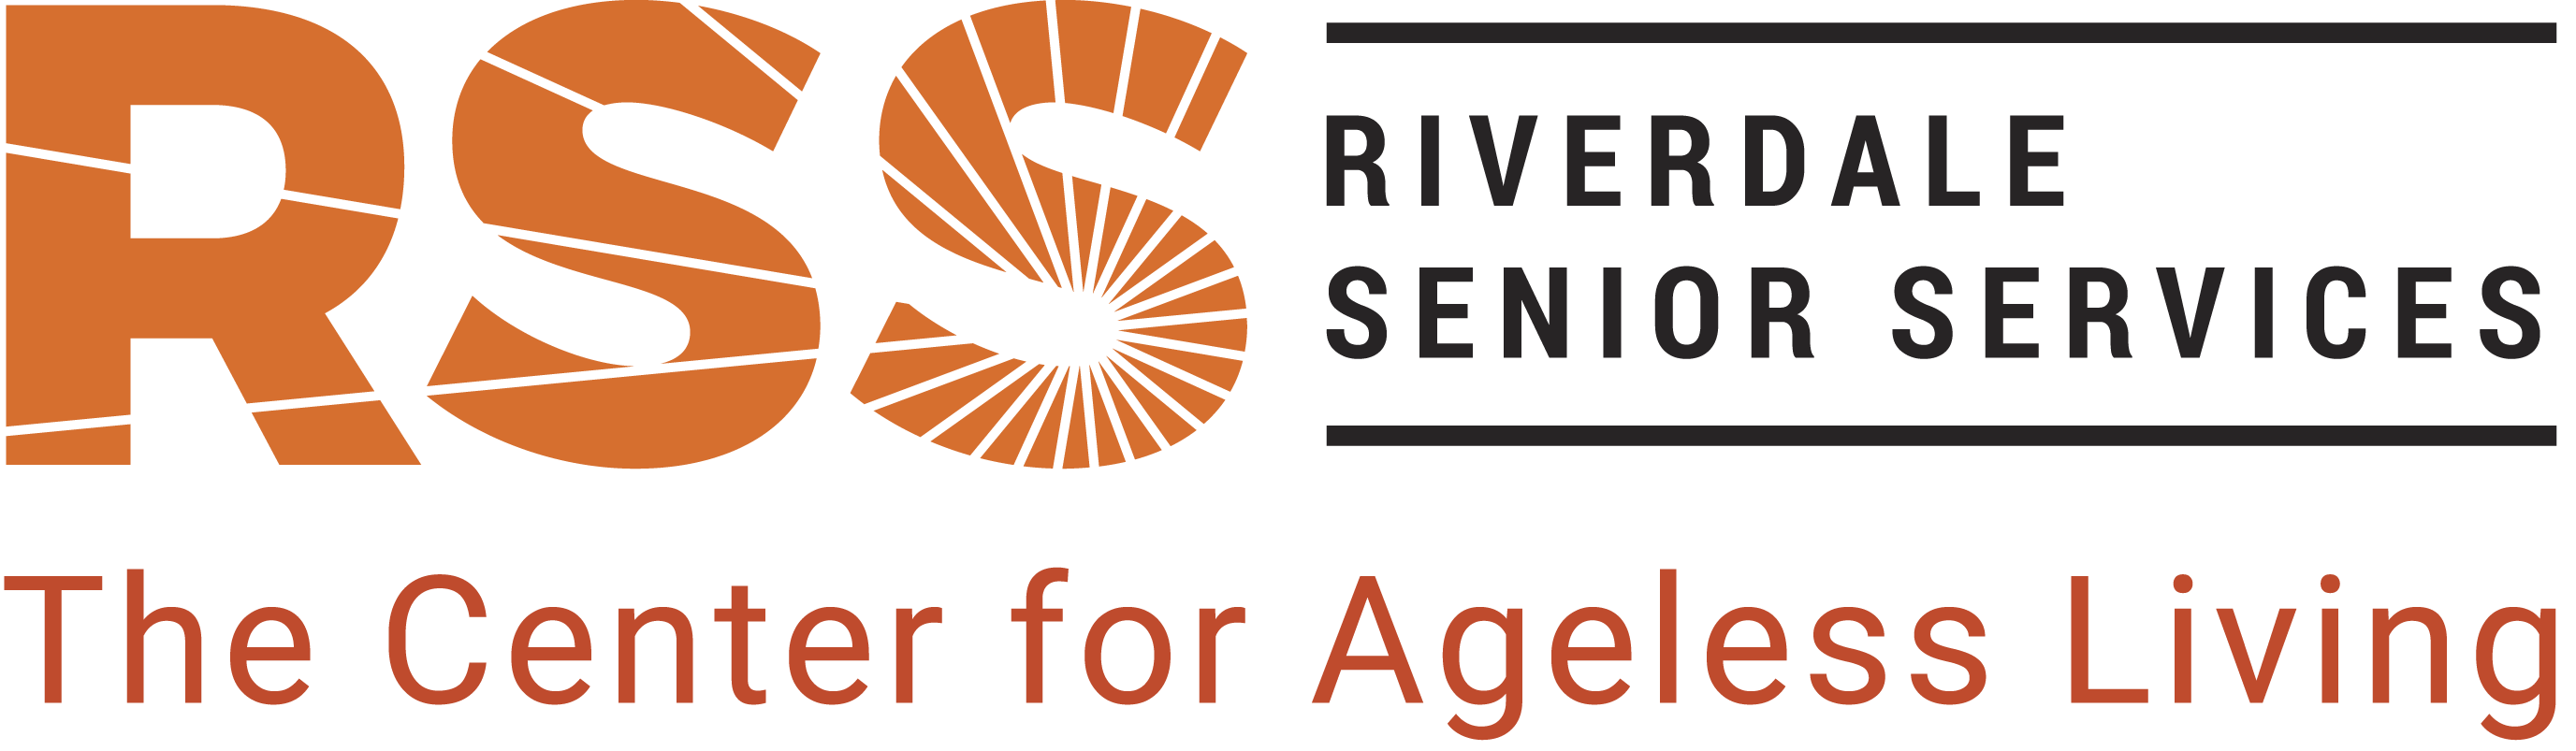 Riverdale Senior Services Is Now RSS